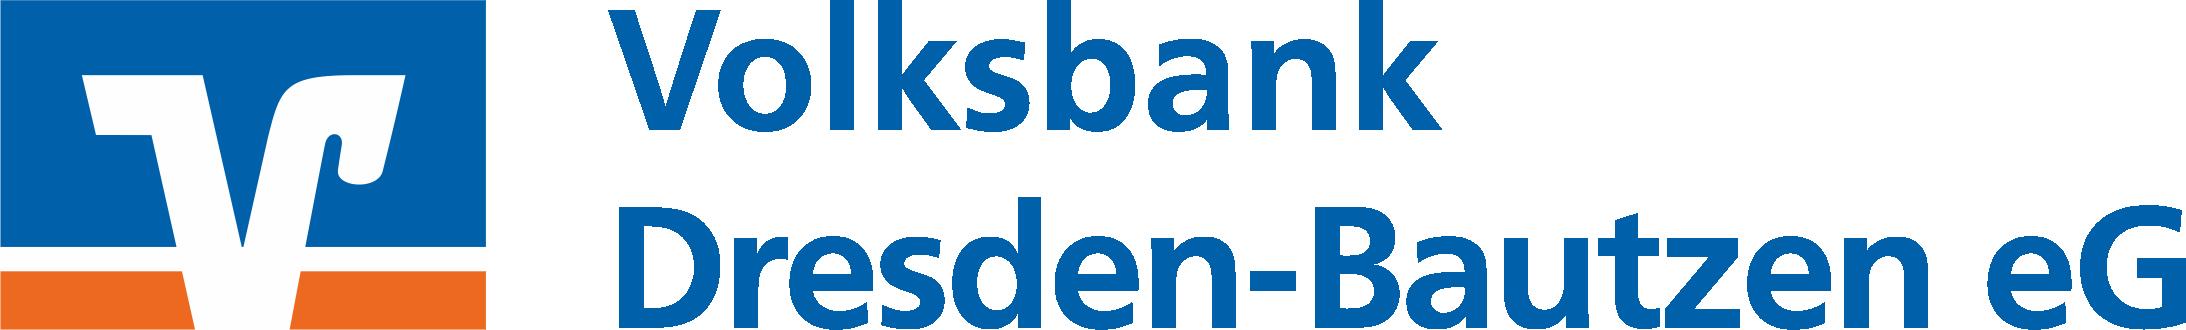 Volksbank Dresden Bautzen